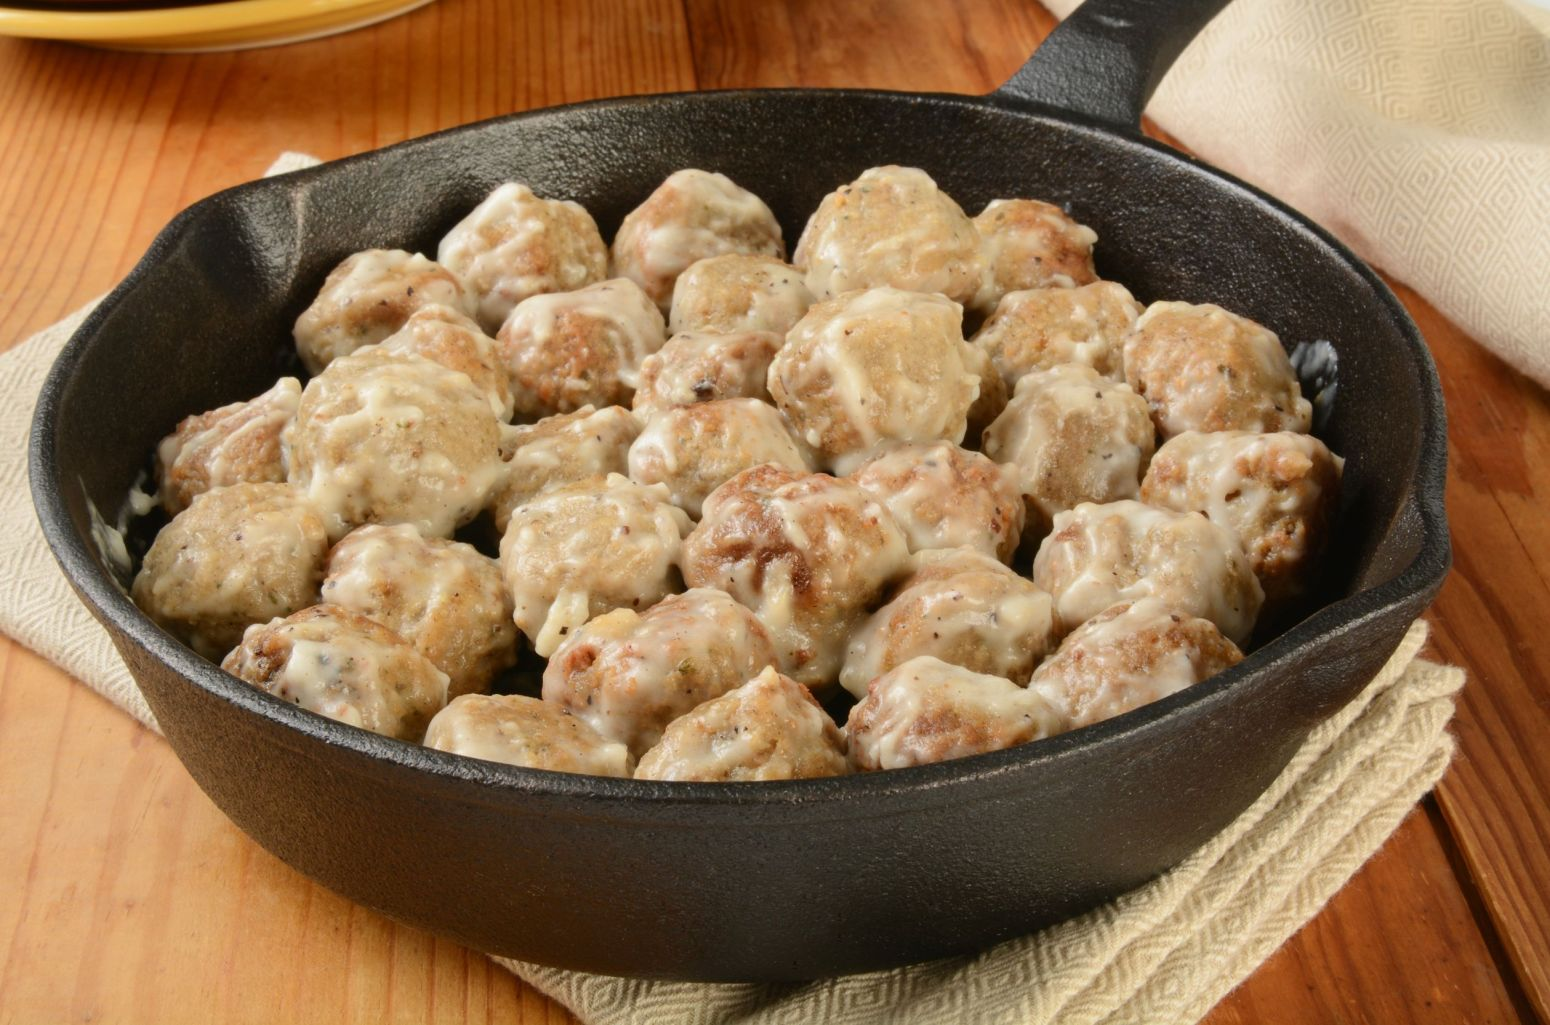 Ikea Swedish Meatballs Recipe 4   Just A Pinch Recipes